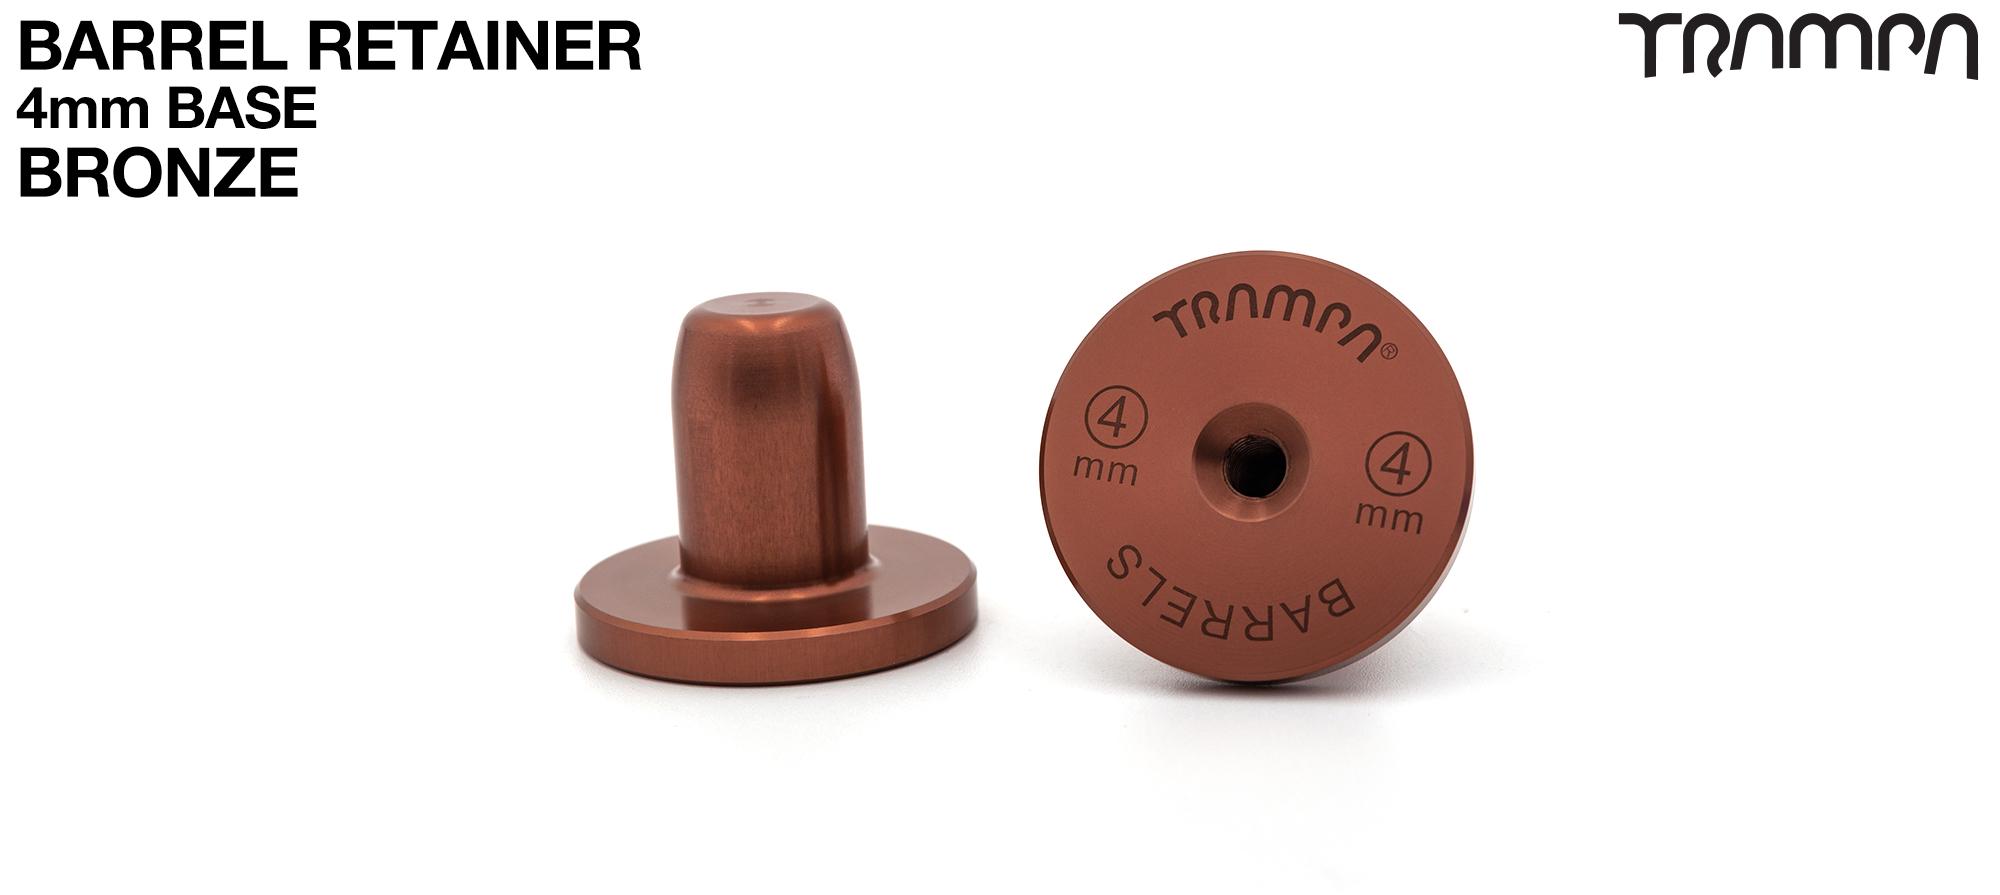 BARRELS Retainer 4mm BASE - BRONZE